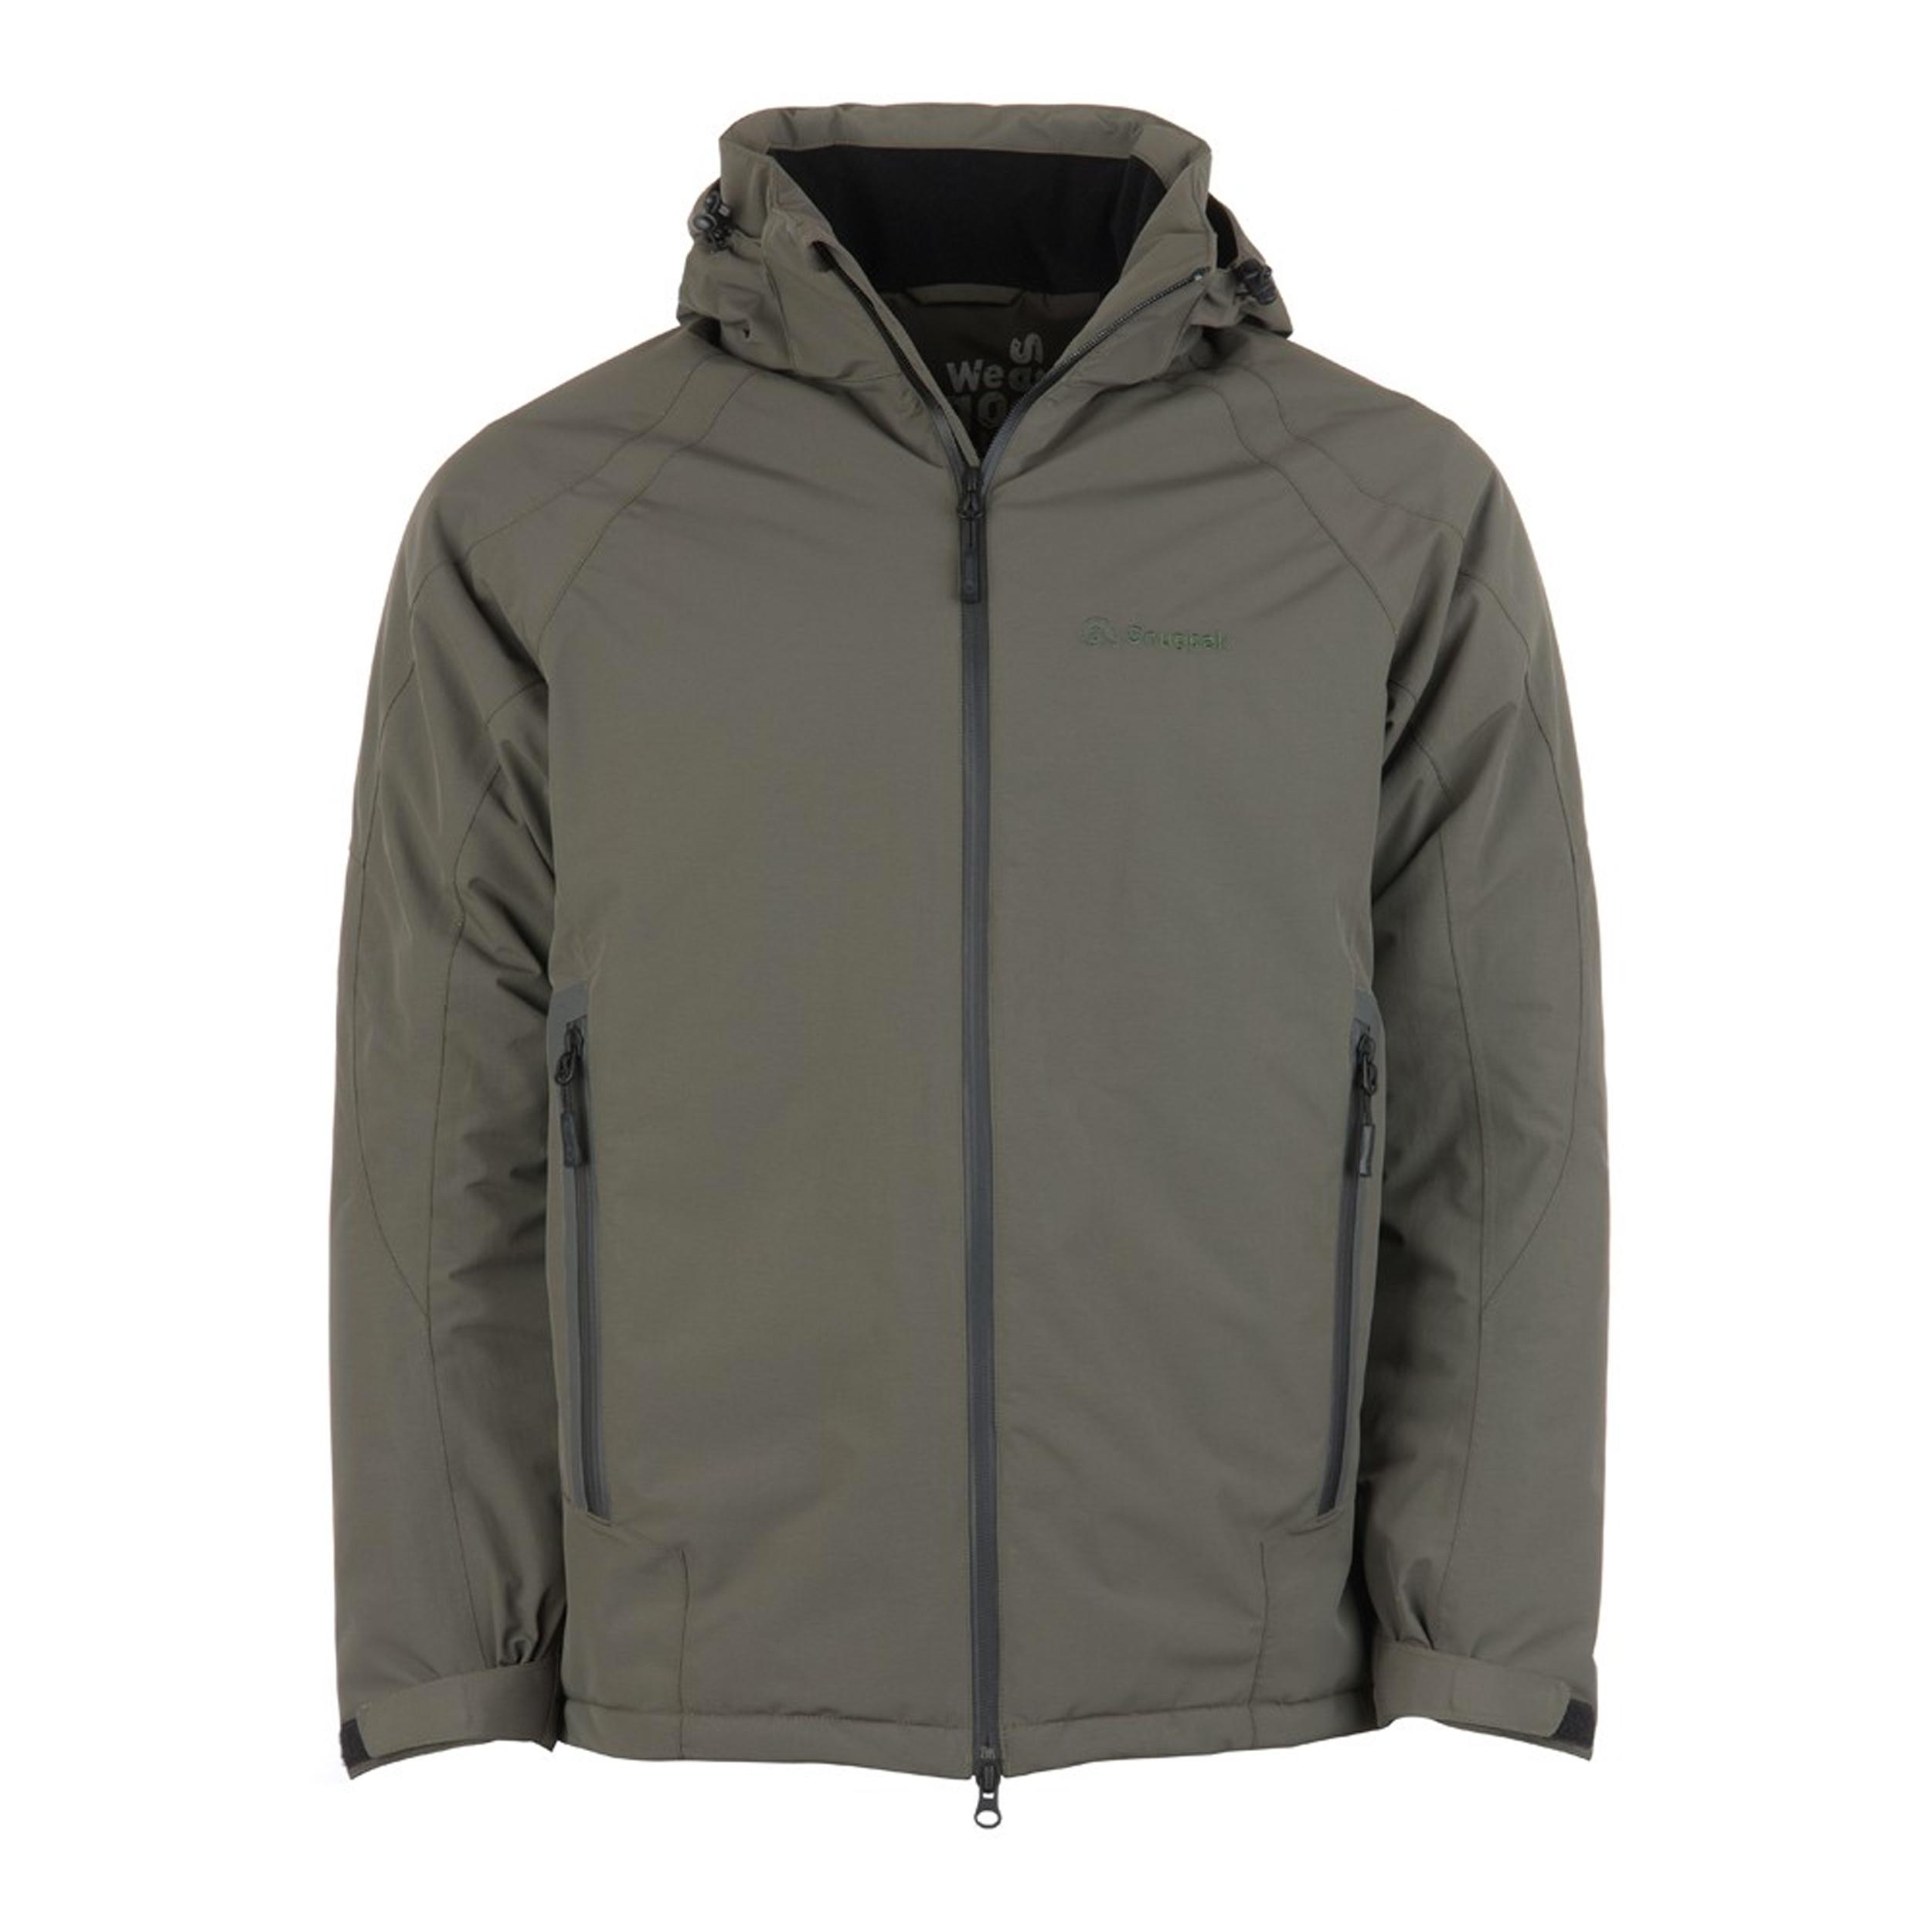 Snugpak Torrent Waterproof Jacket Forest Green XXLarge